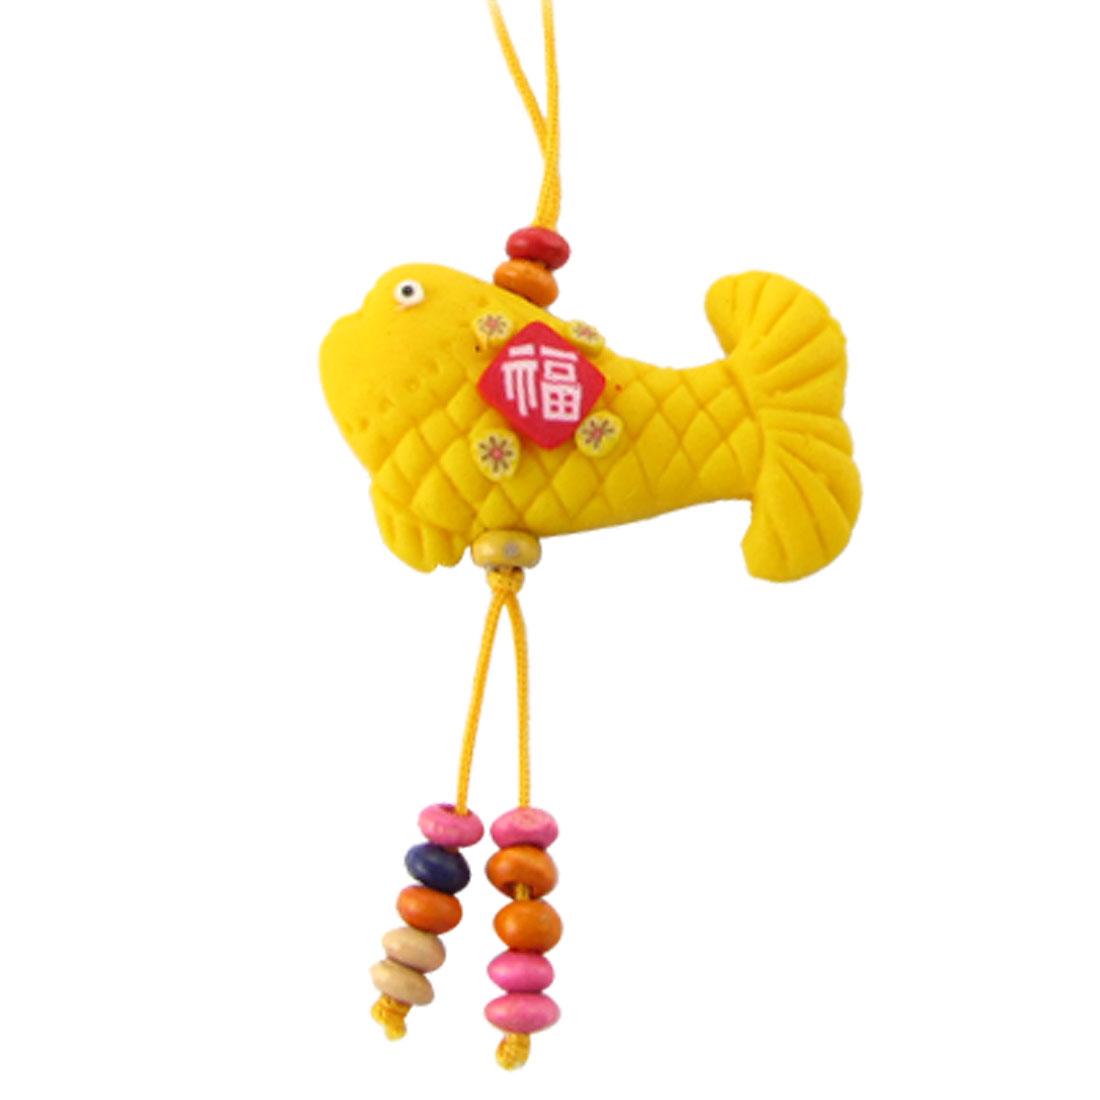 1 PCS Yellow Rubber Fish Pendant Mobile Strap Phone Charm